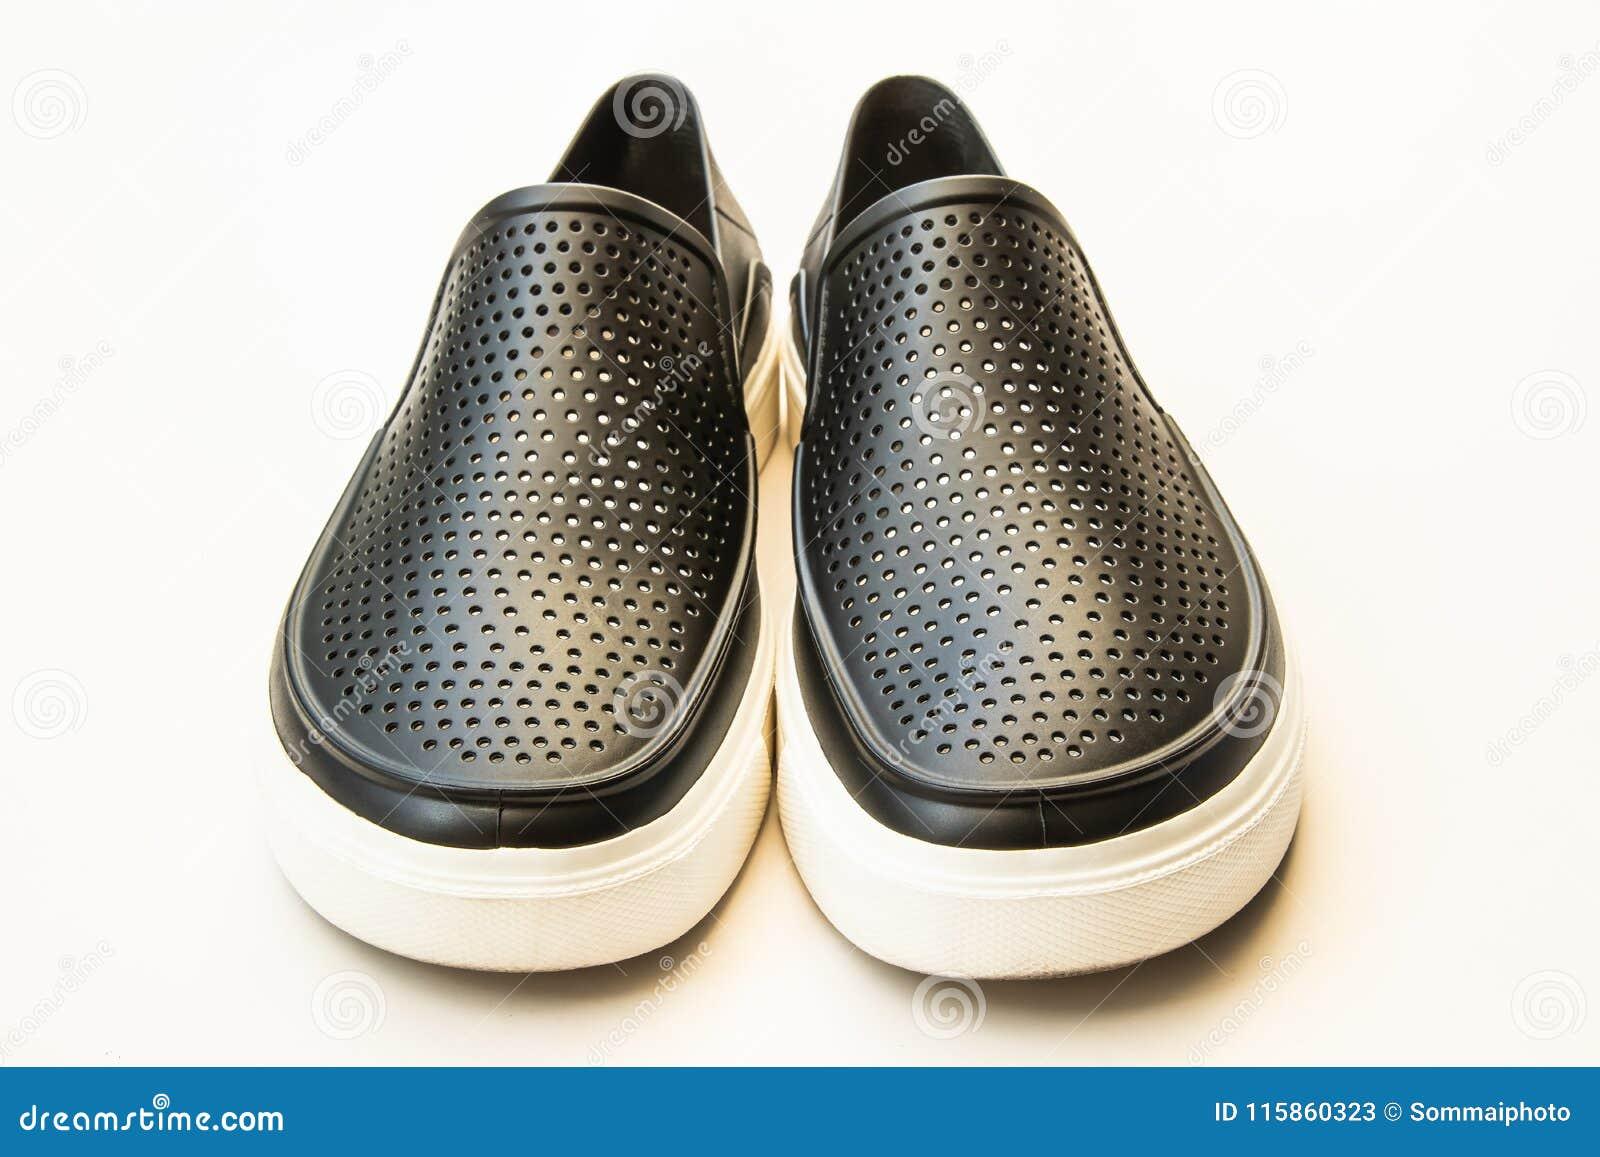 b519930baa9 Μαύρα λαστιχένια παπούτσια μόδας ατόμων ` s, περιστασιακό σχέδιο που  απομονώνεται στο λευκό